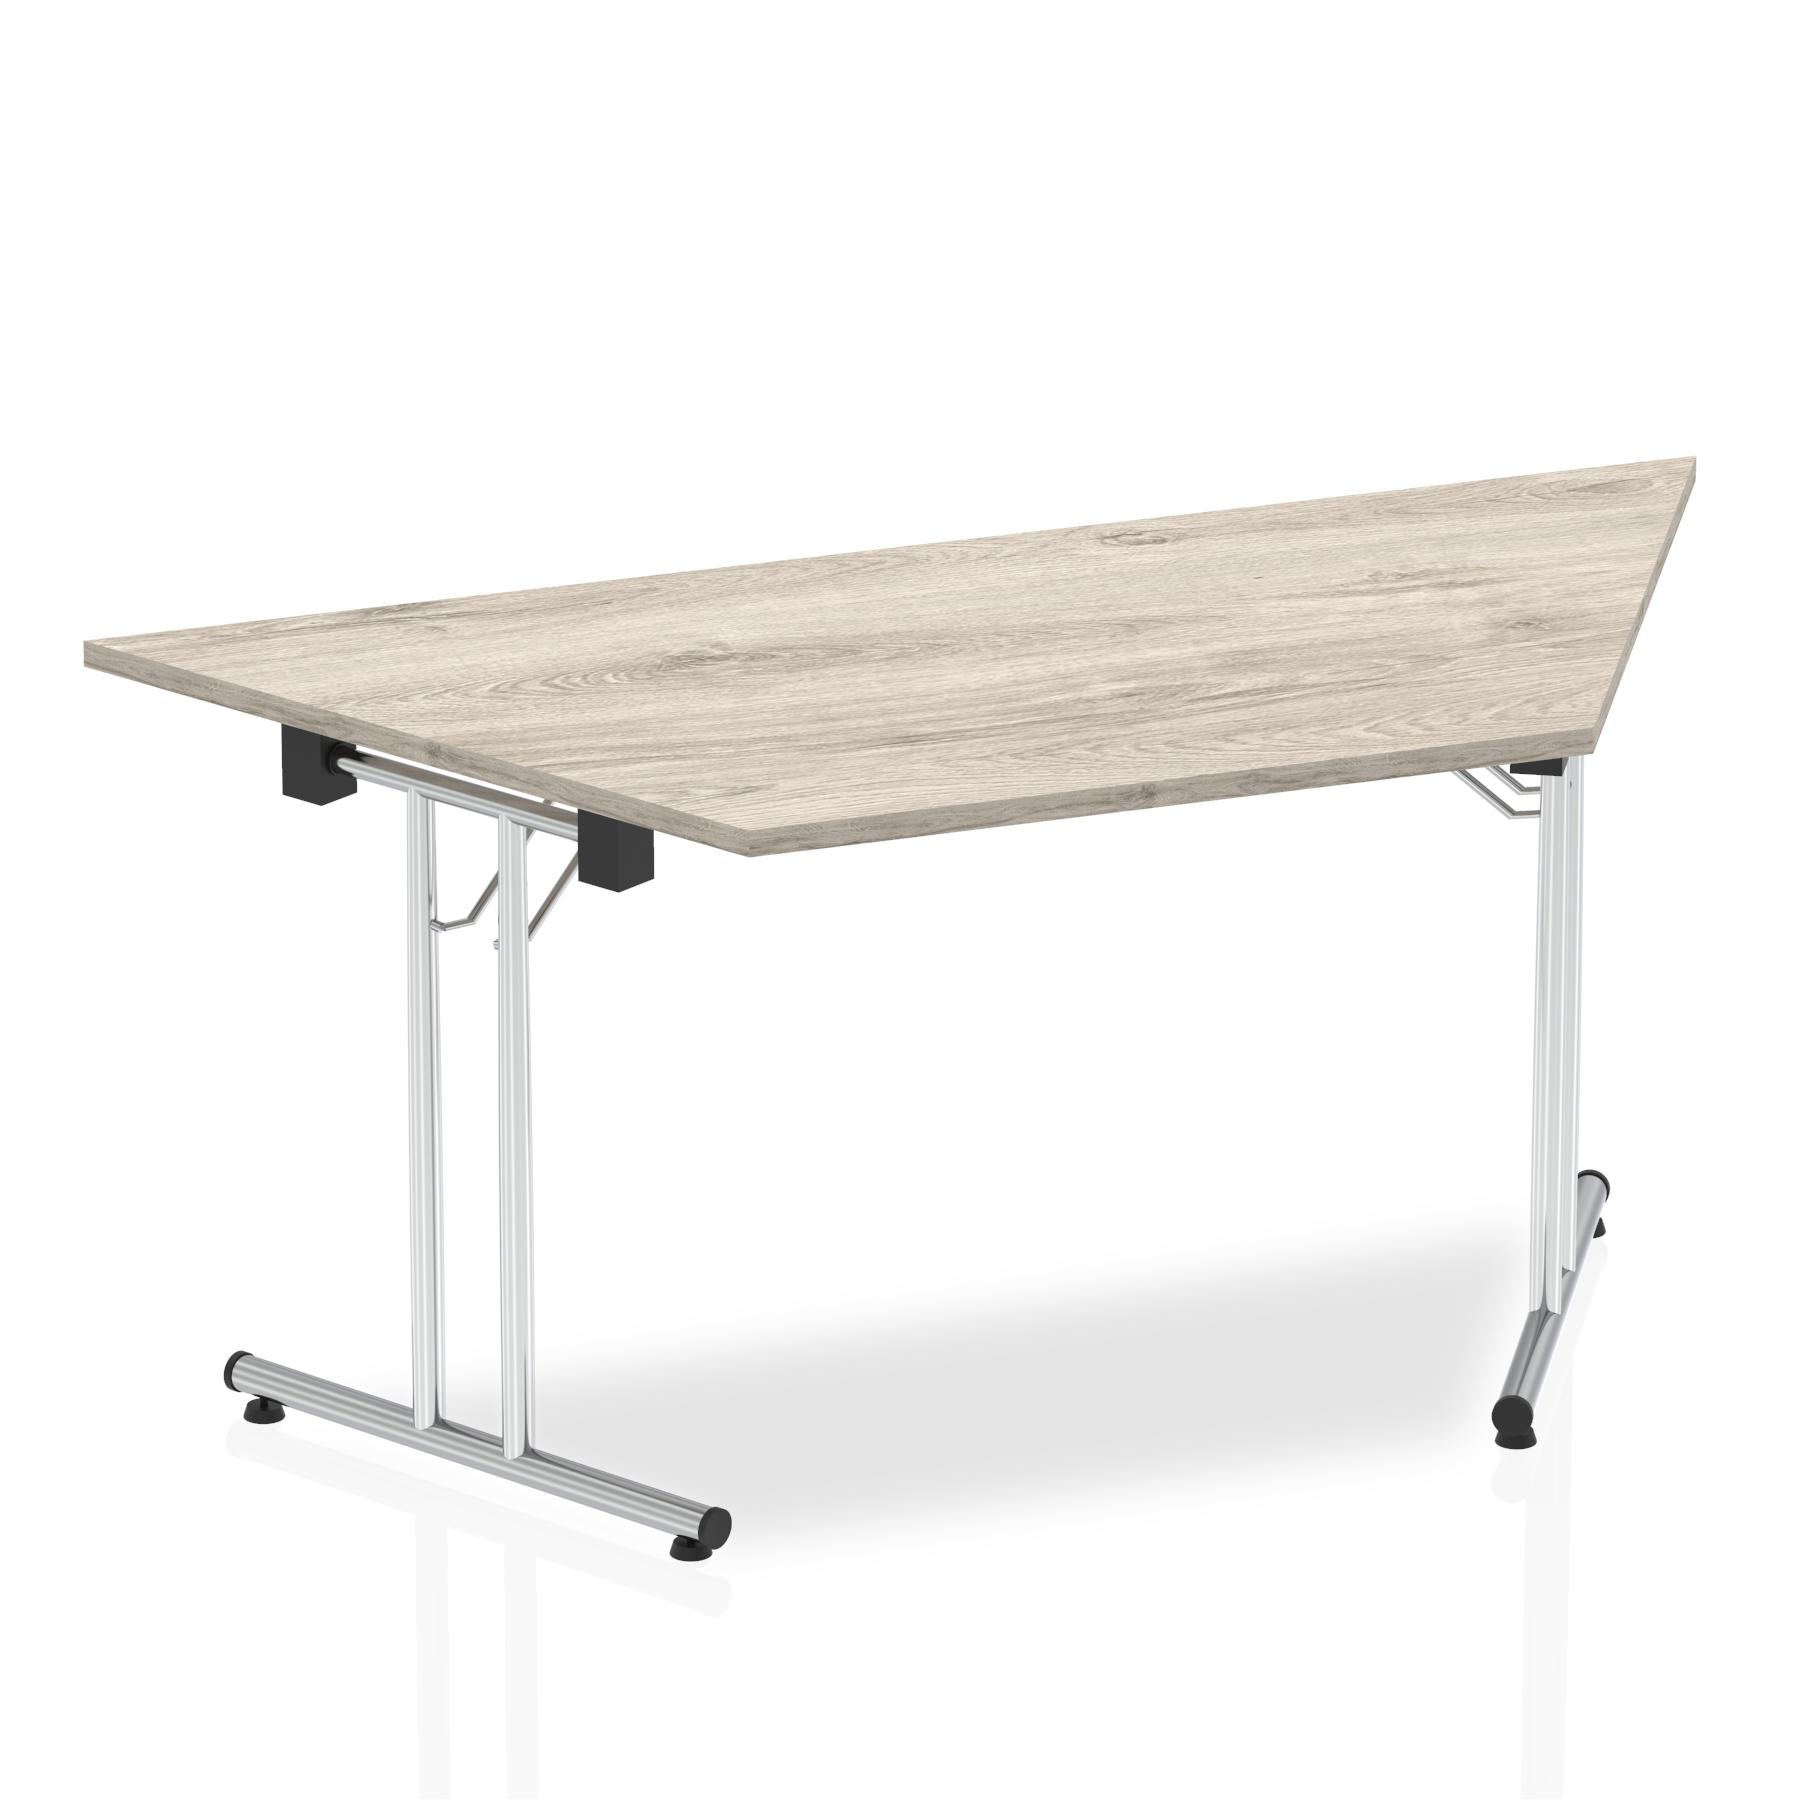 Sonix Trapezoidal Chrome Leg Folding Meeting Table 1600x800mm Grey Oak Ref